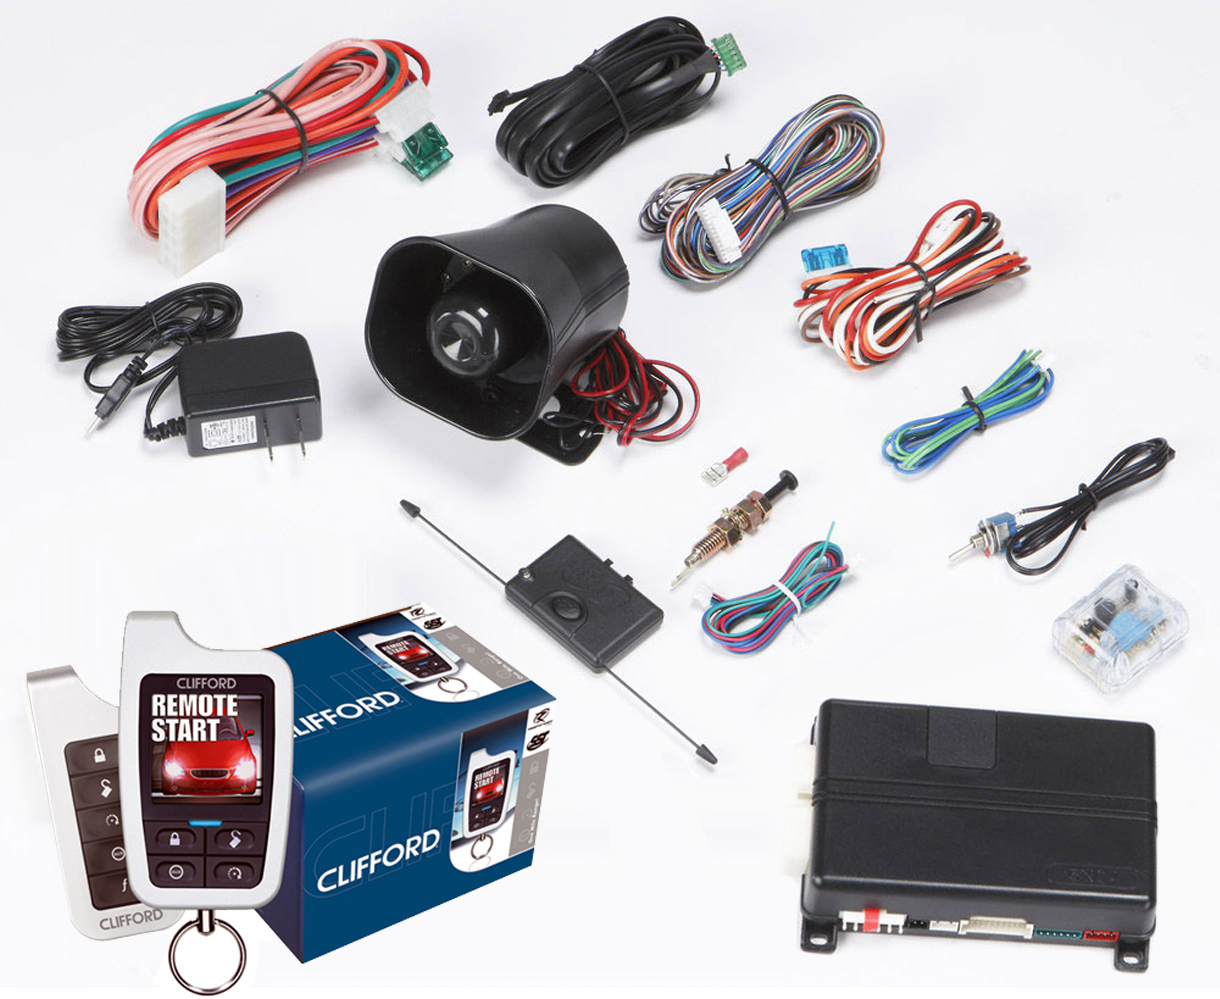 hight resolution of clifford 590 4x 2 way hd car alarm system remote start python dsm200 python remote start wiring diagram